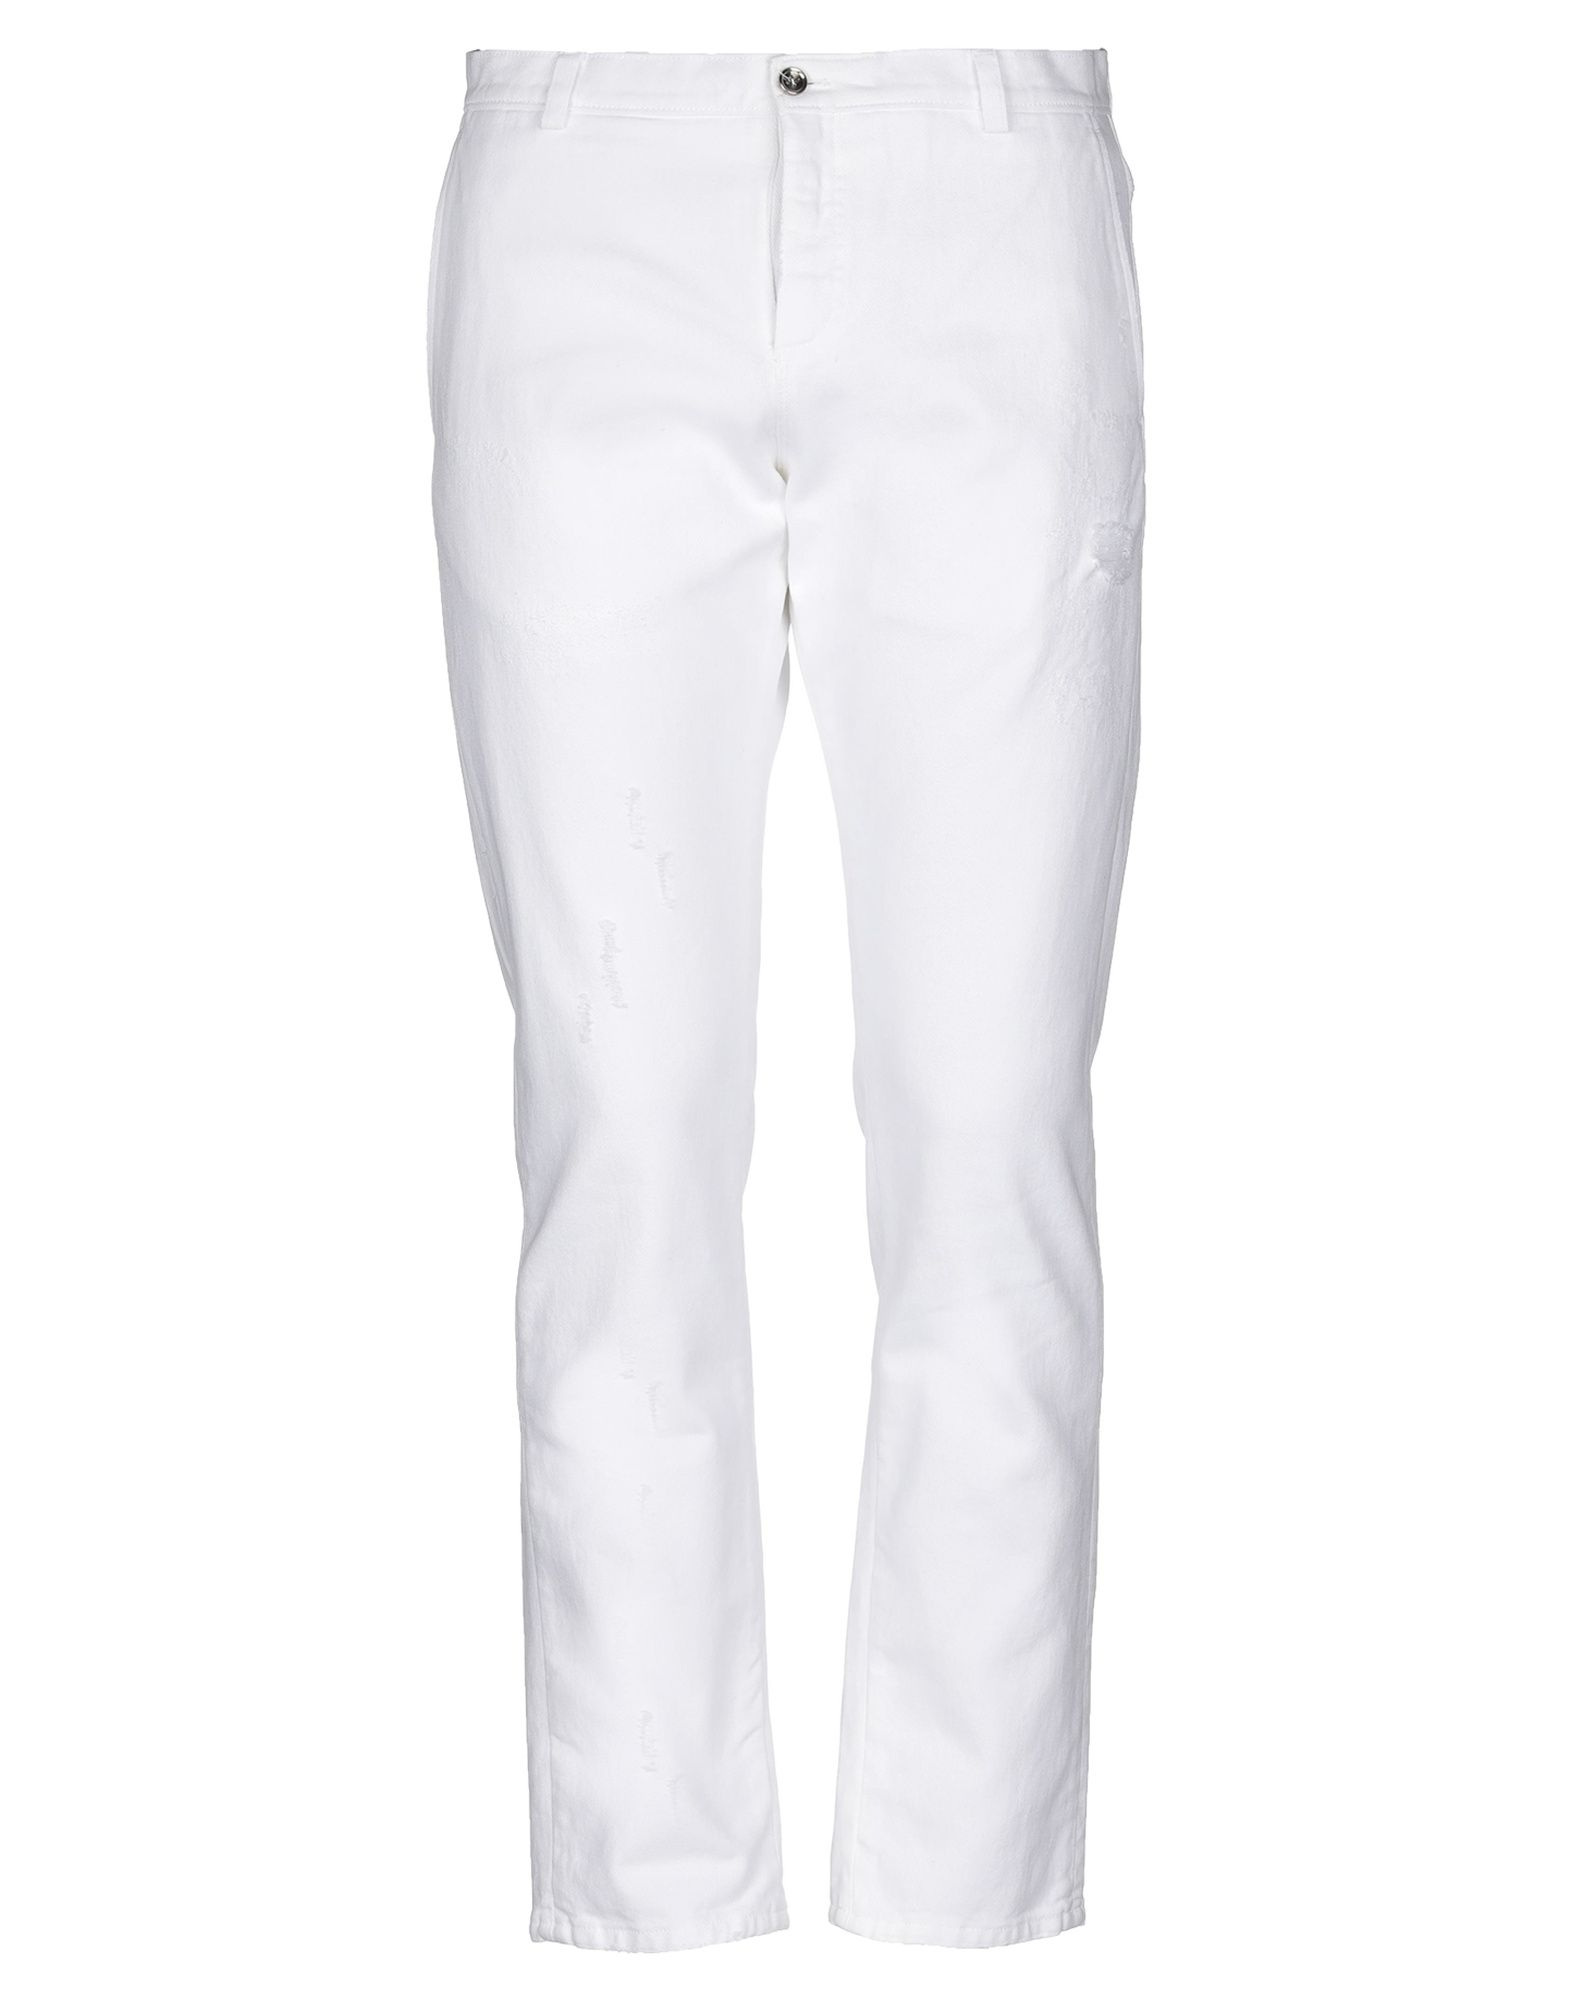 3a3936ec8 Buy gucci jeans for men - Best men's gucci jeans shop - Cools.com